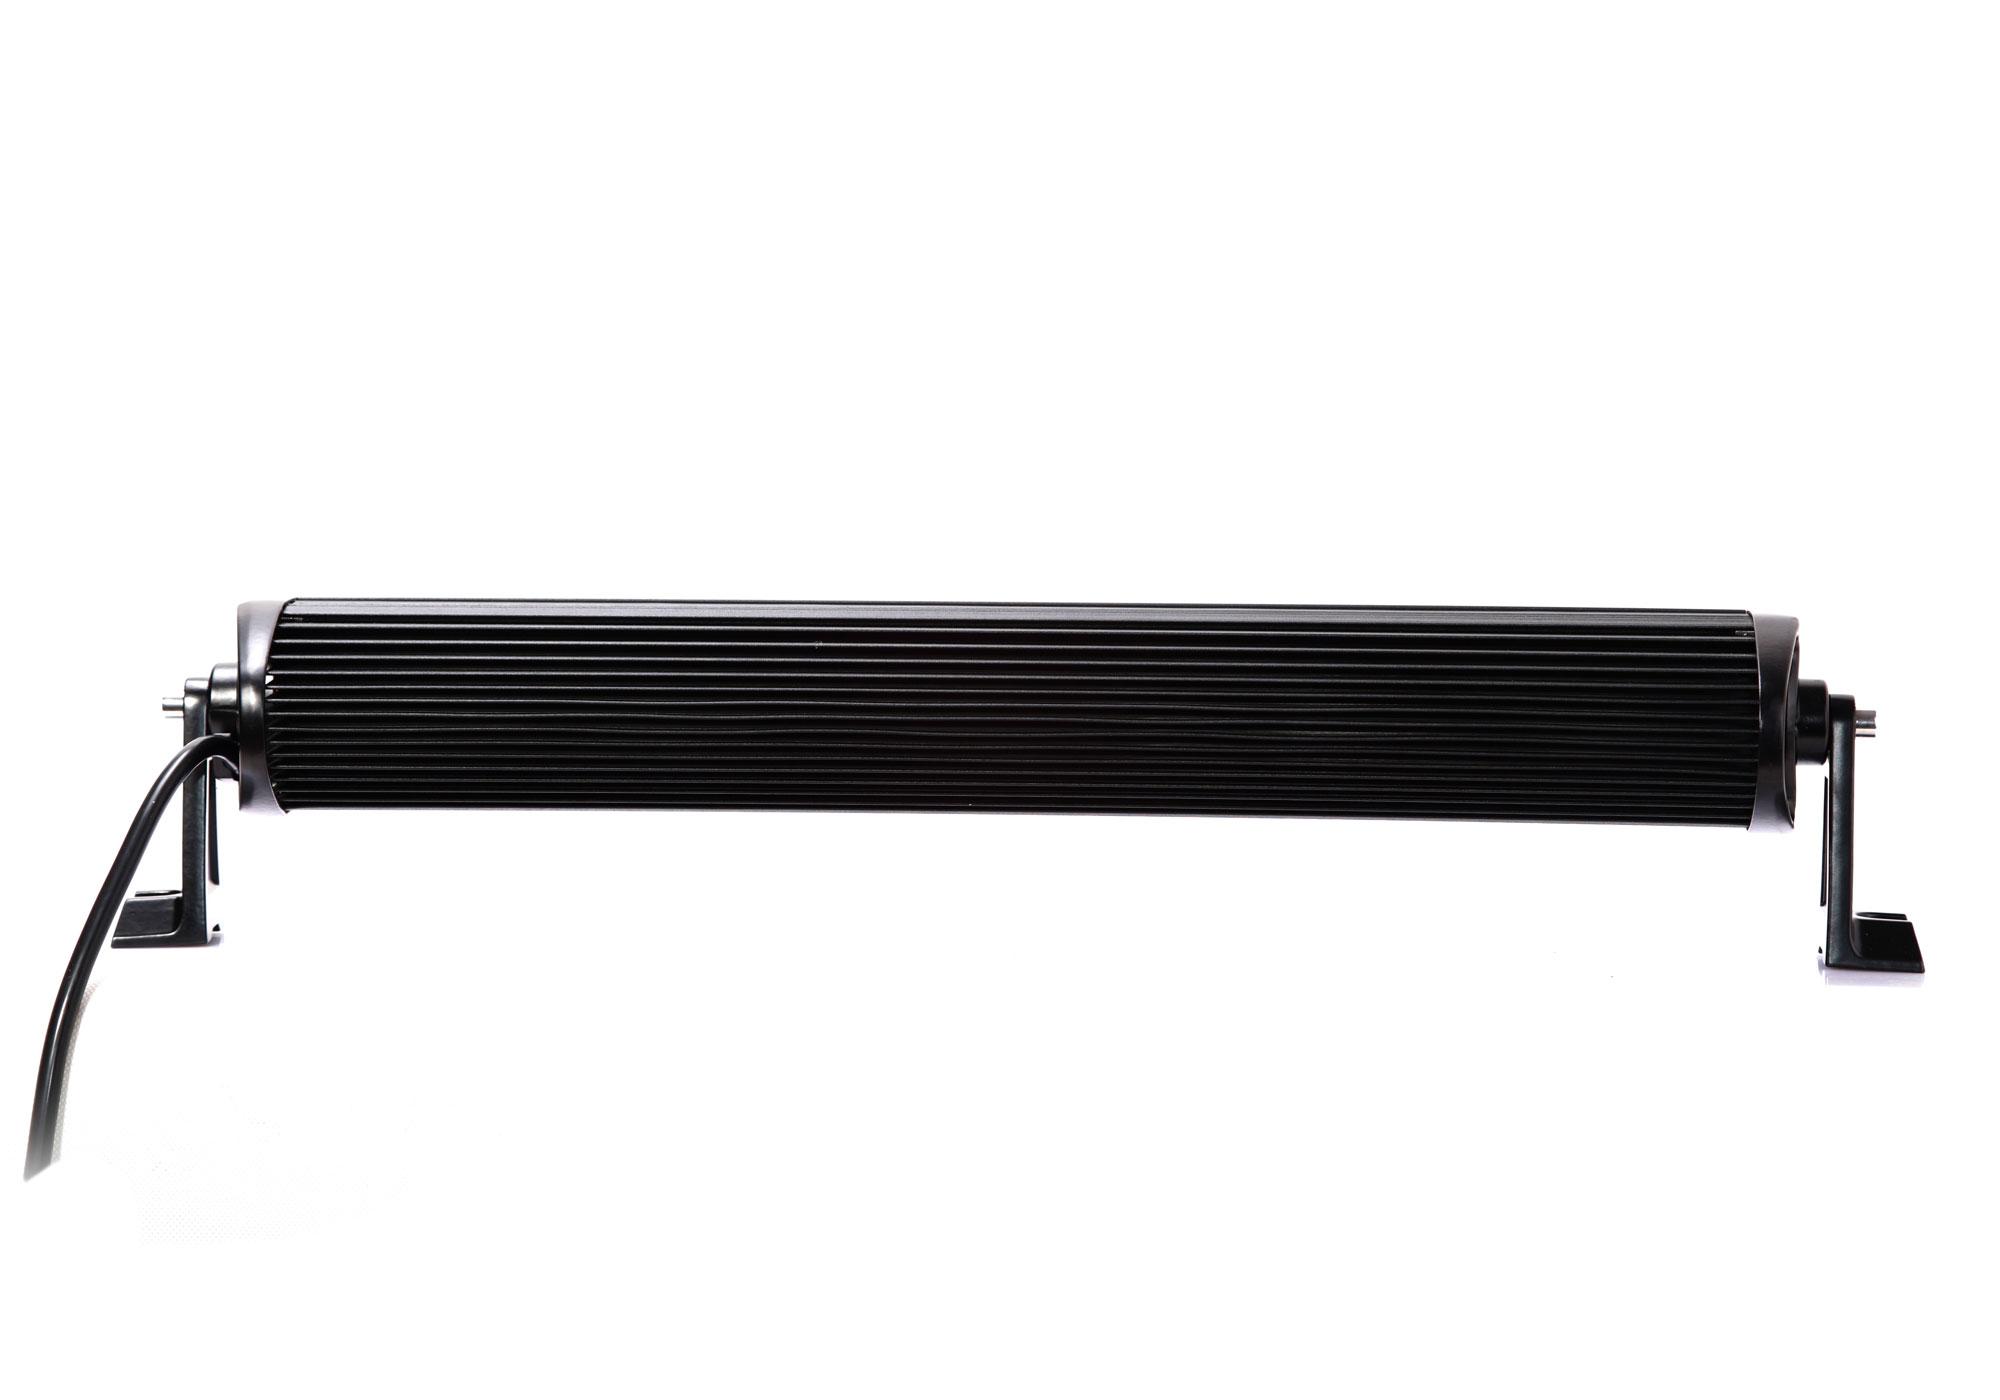 Curved Series Led Light Bar 22 Inch 120 Watt Combo